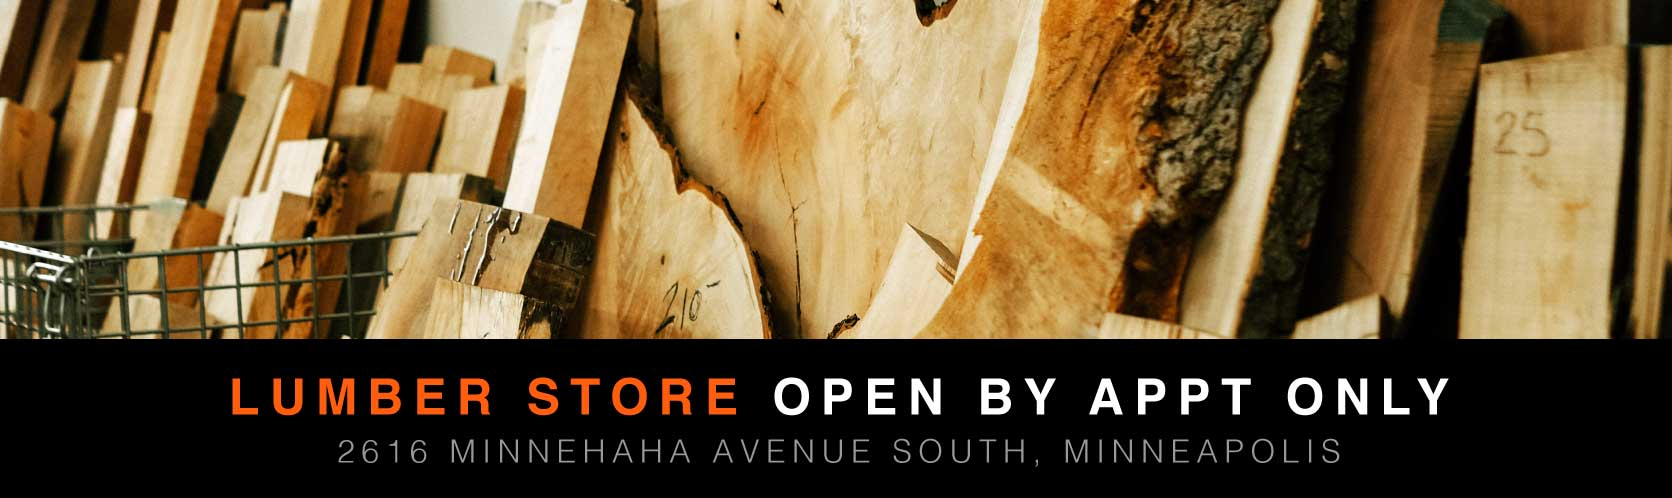 Minneapolis Lumber Store